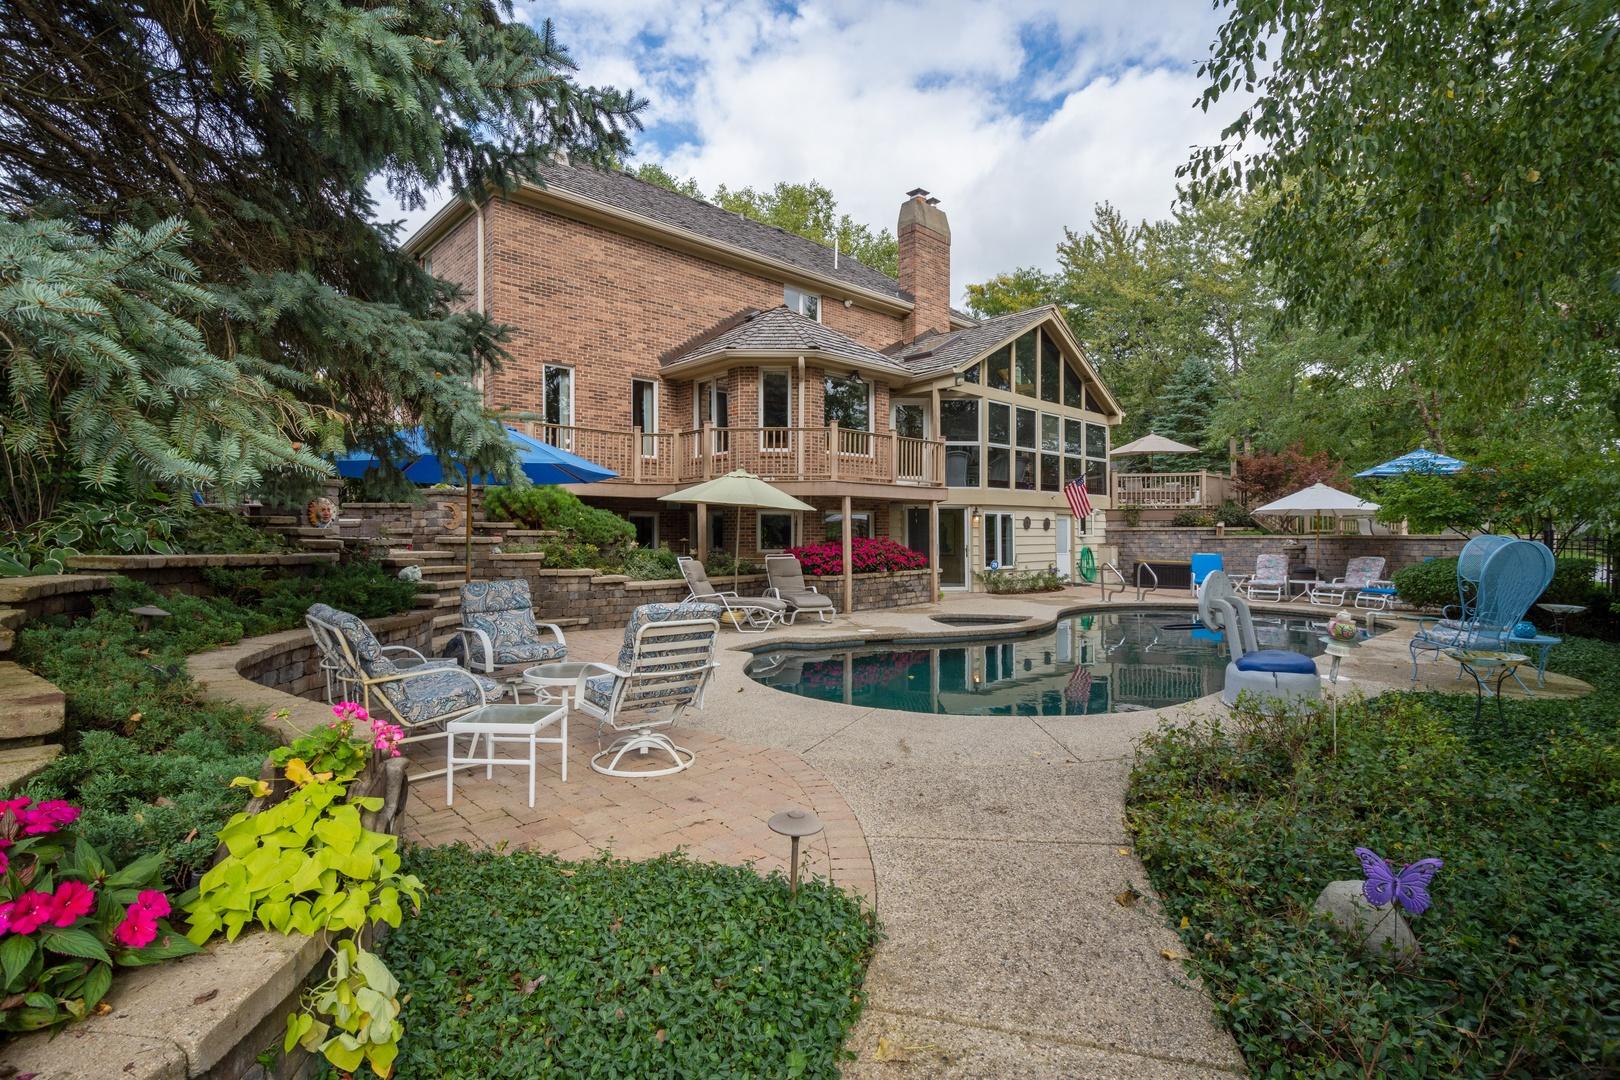 775 Summer Isle, Inverness, Illinois, 60010